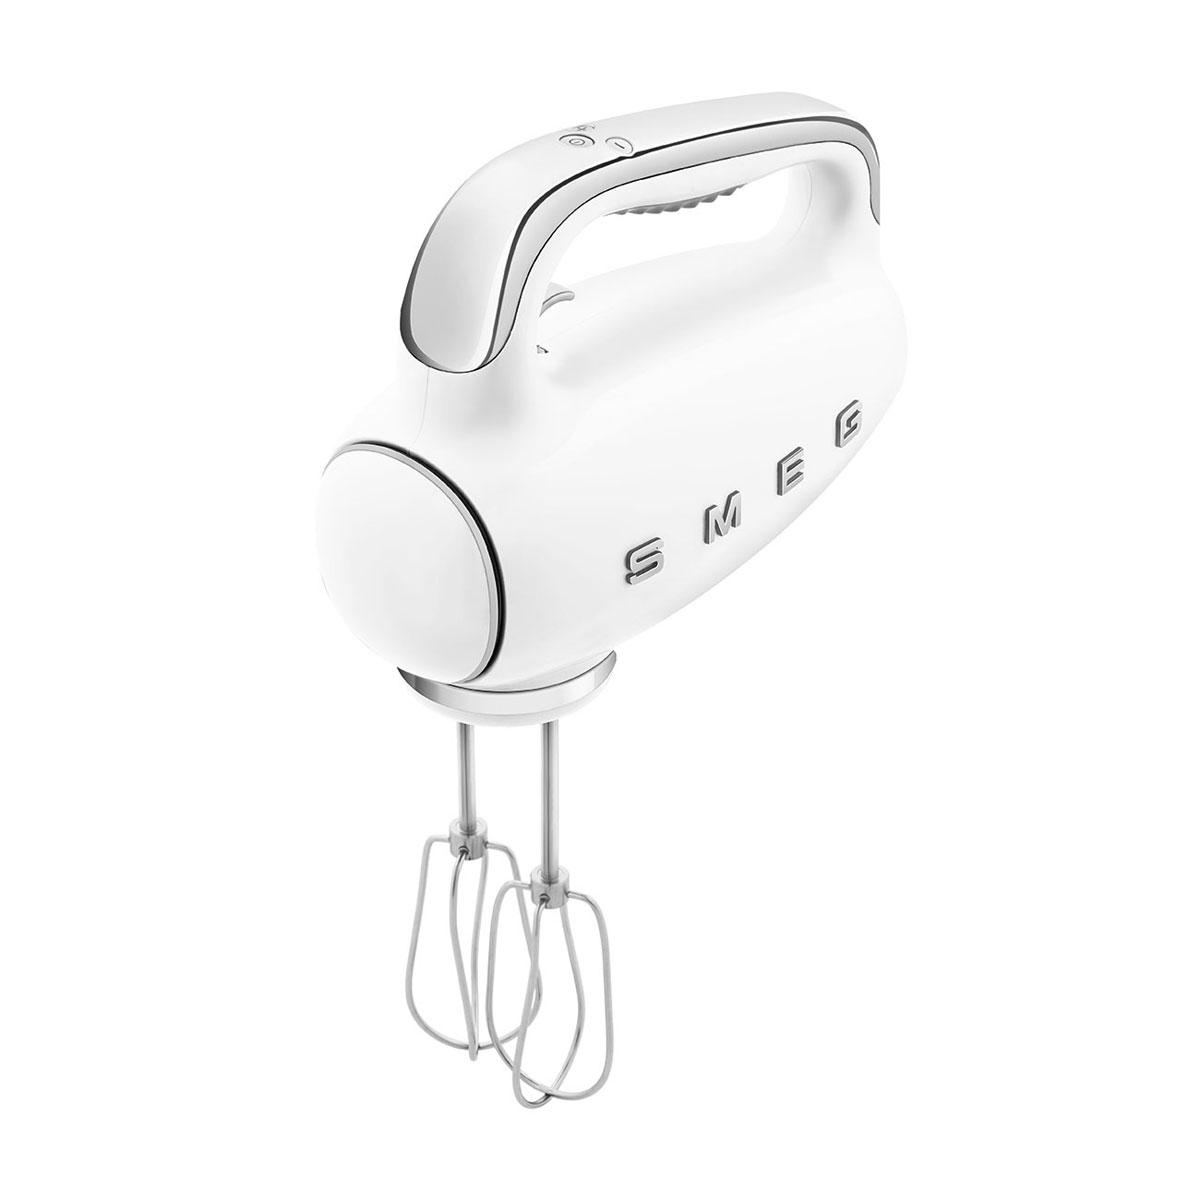 Smeg Retro Handmixer 50´s Style - Weiß